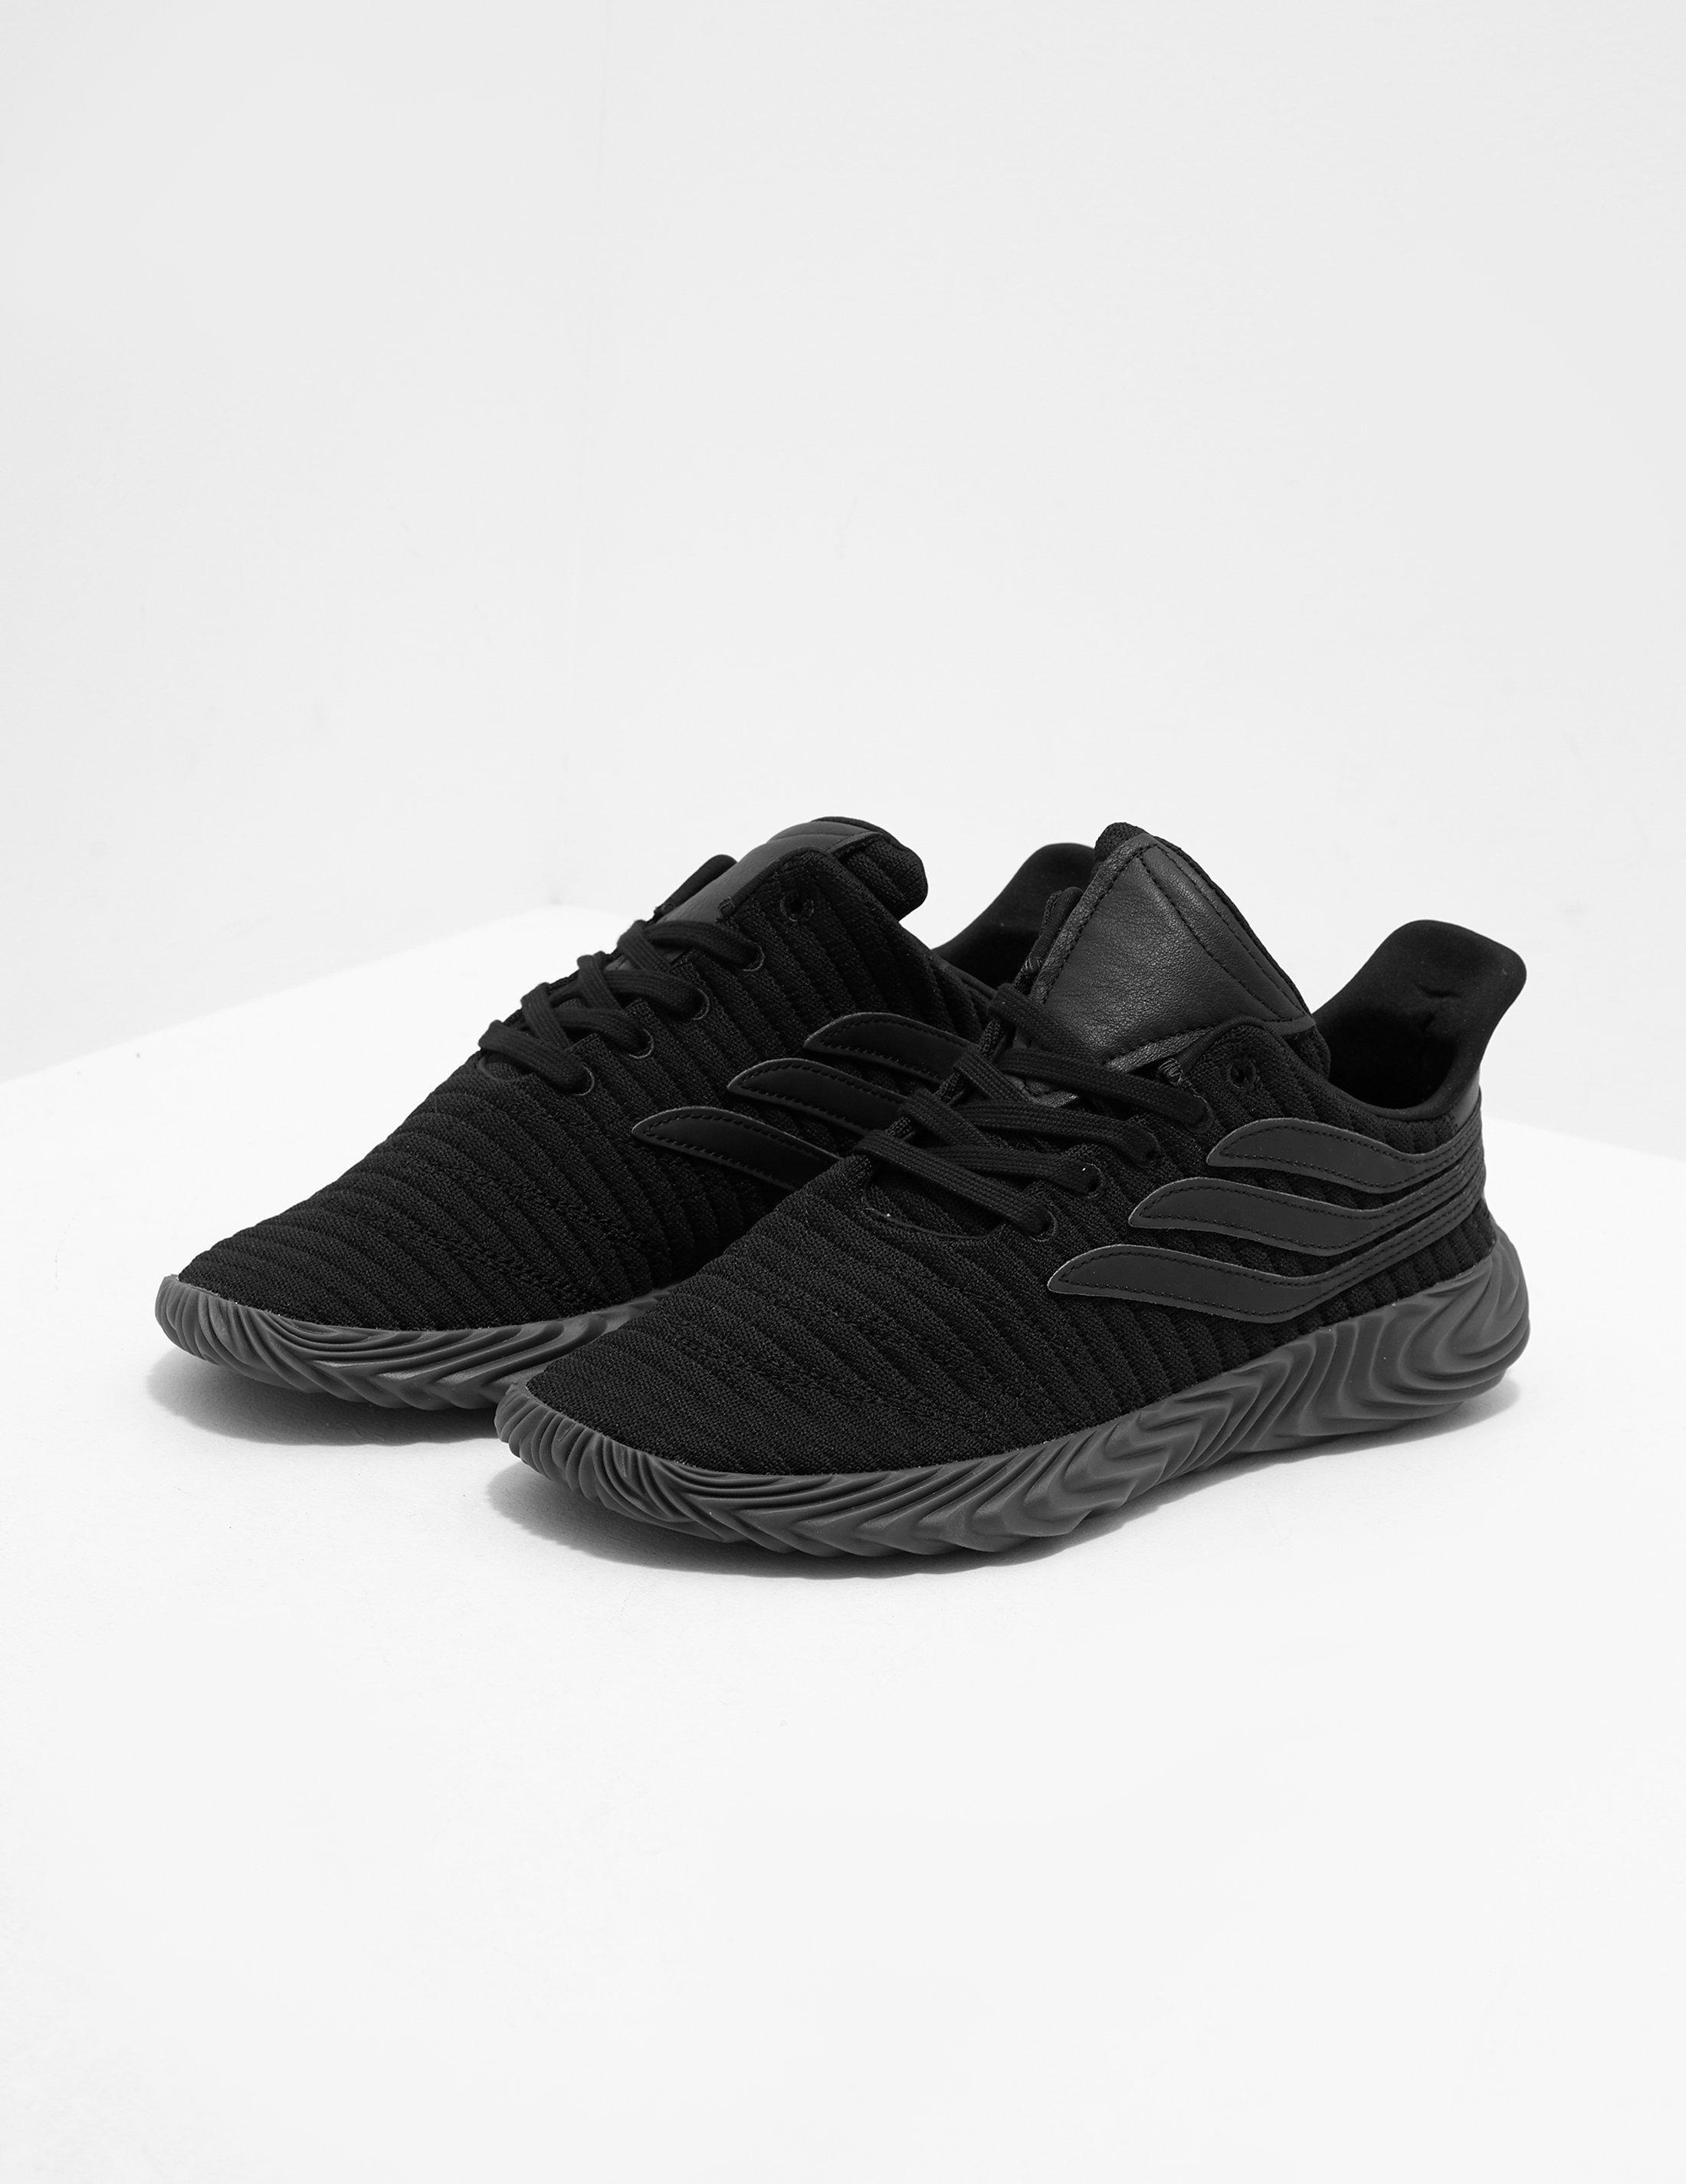 956b0e07141 adidas Originals Mens Sobakov Black in Black for Men - Lyst